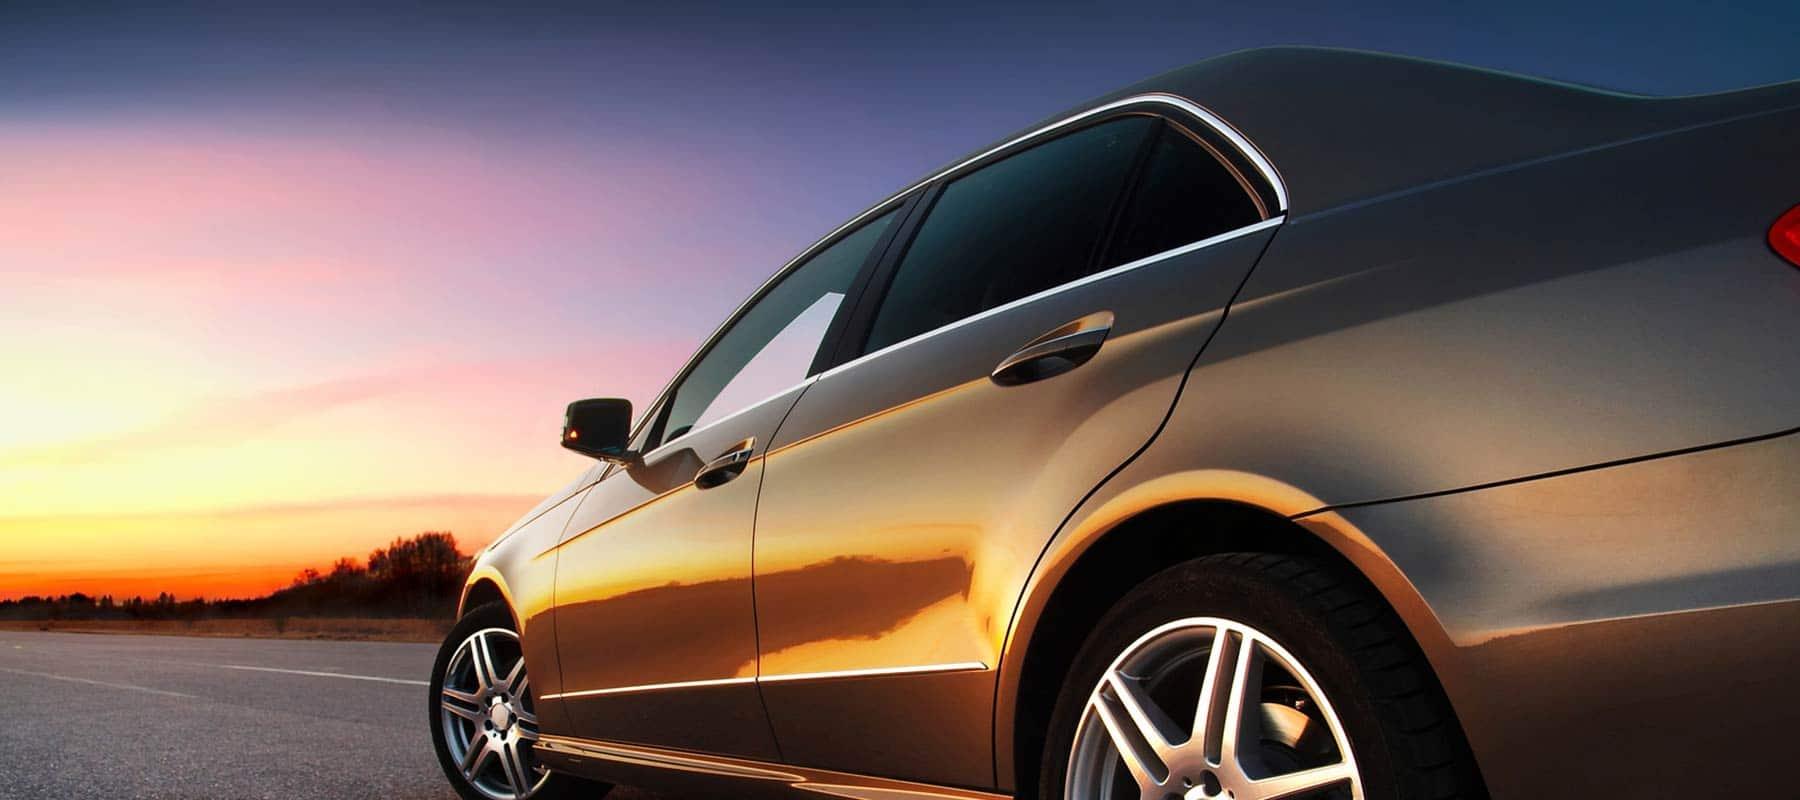 Subaru WRX STI vs. Ford Focus RS Head to Head Track Challenge